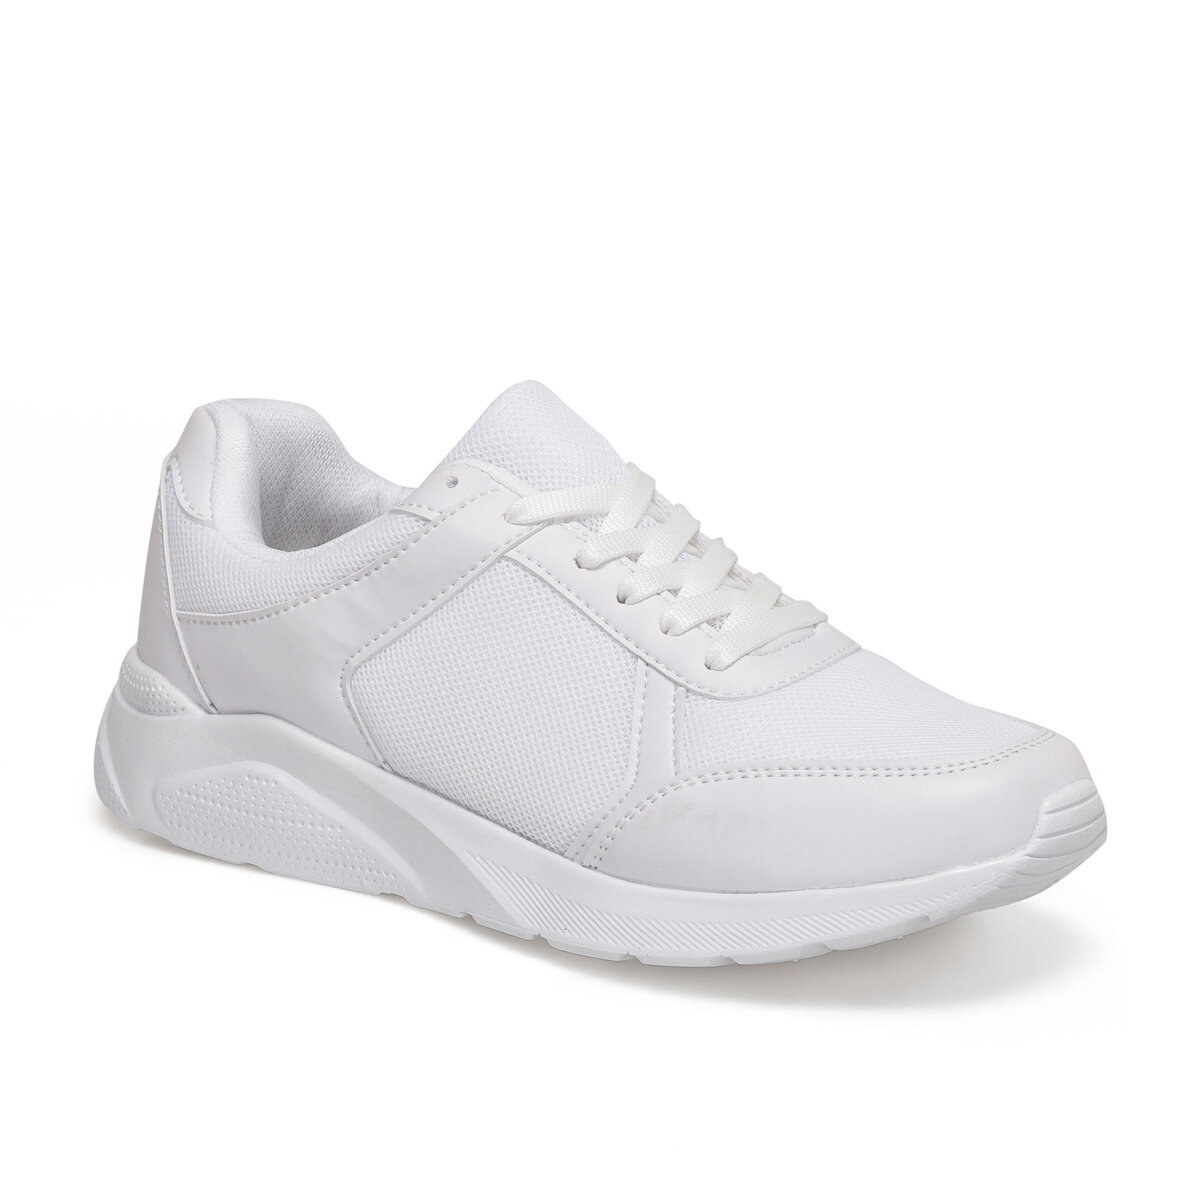 FLO DAREN MESH White Men 'S Sneaker Shoes Torex